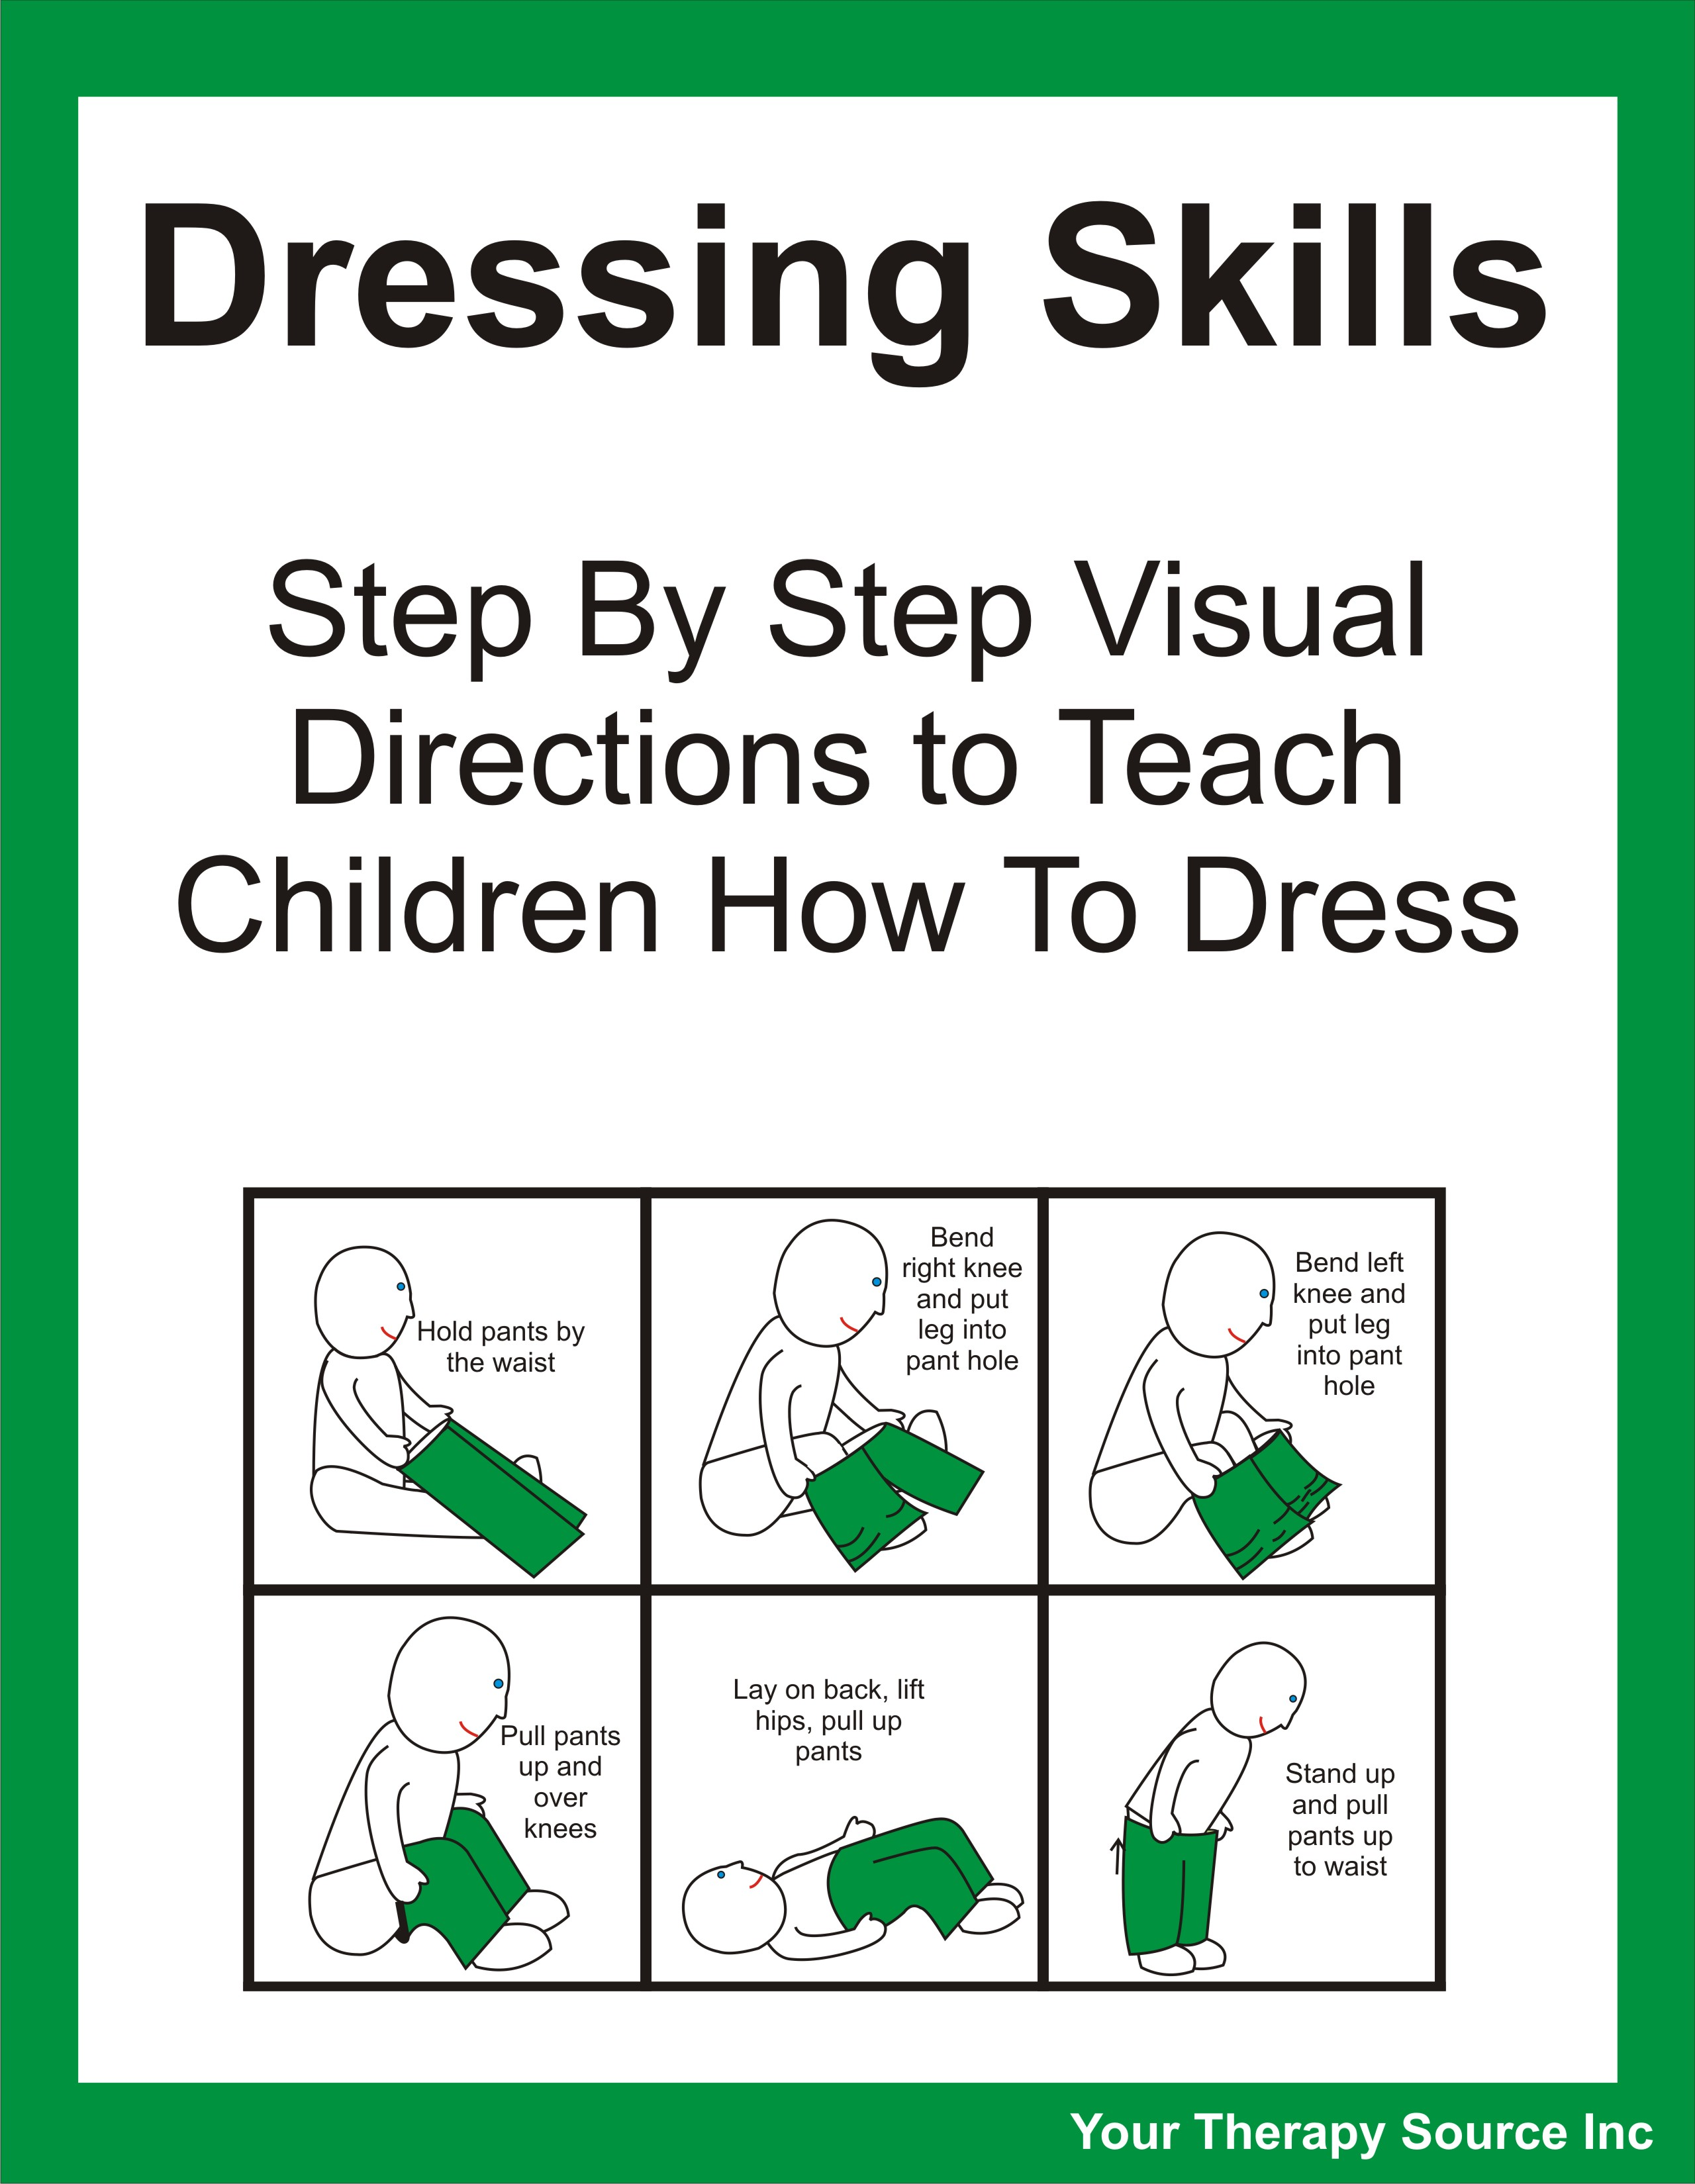 Dressing Skills